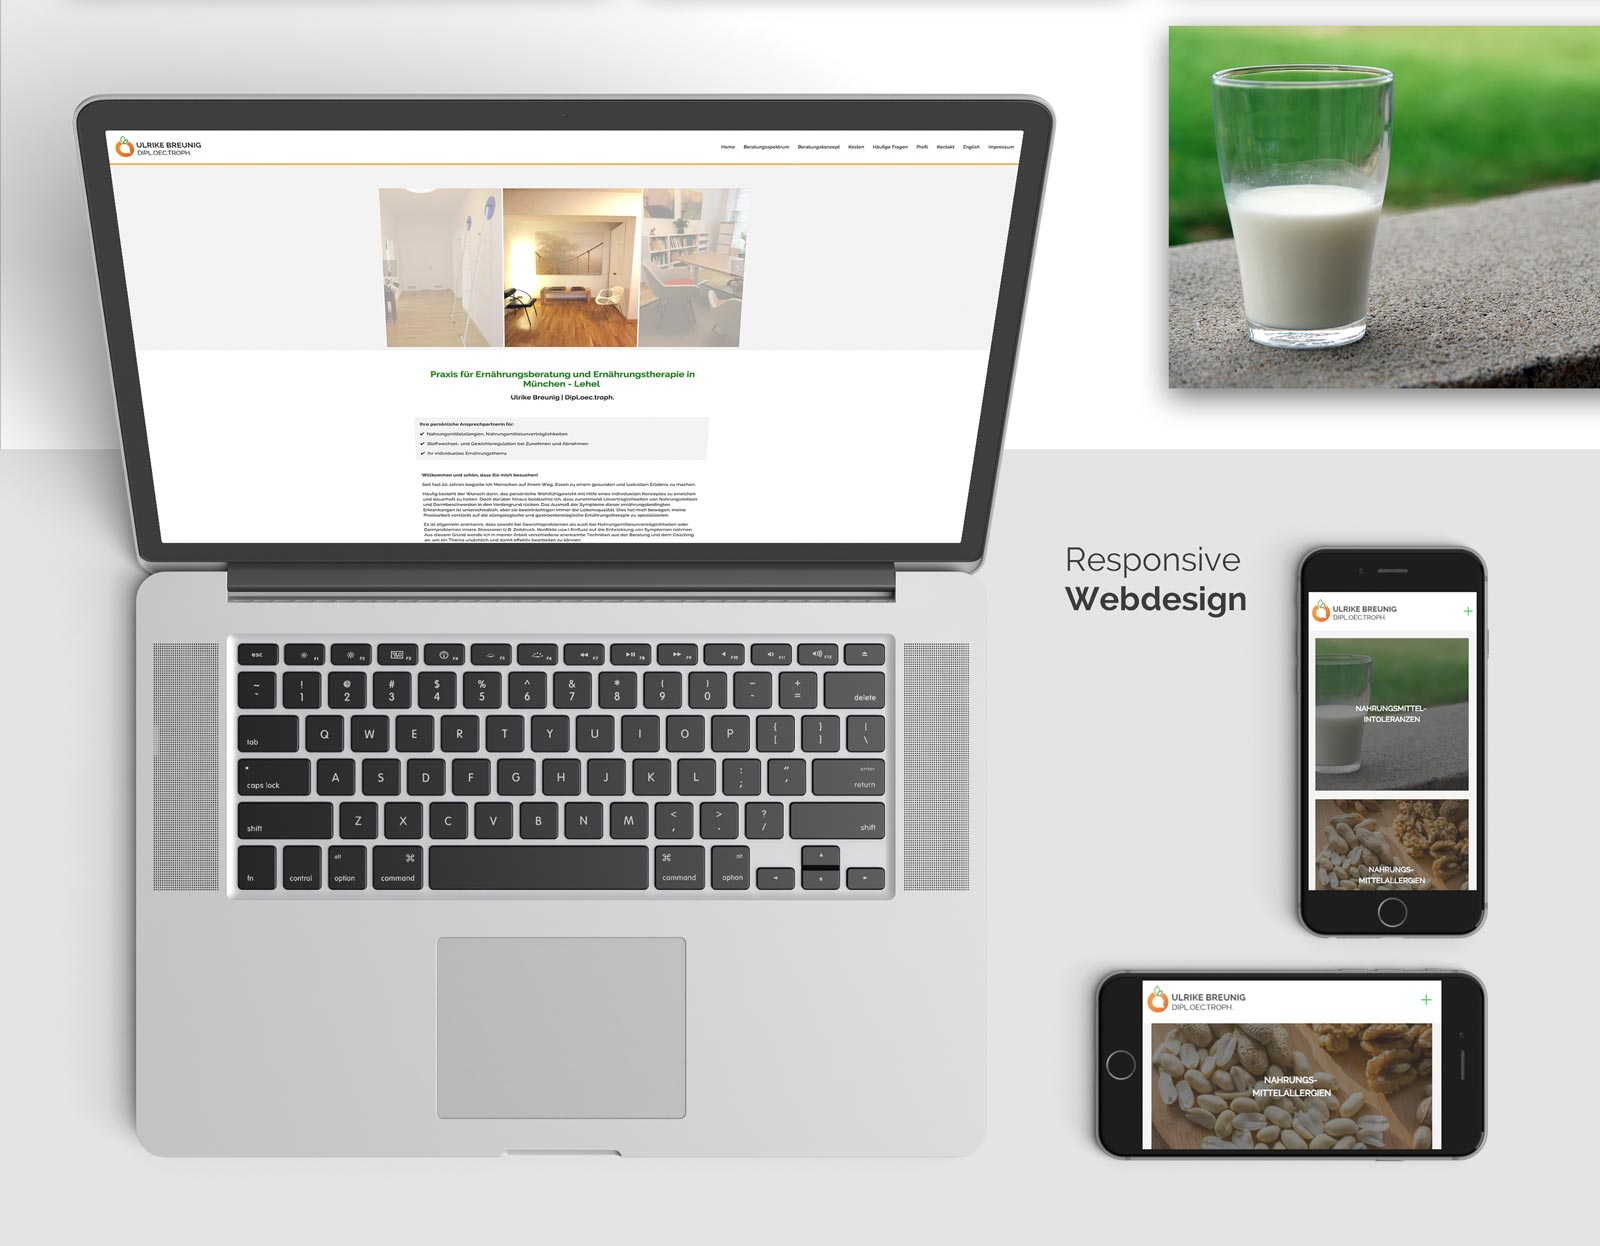 Breunig_Responsive_Webdesign_4.jpg